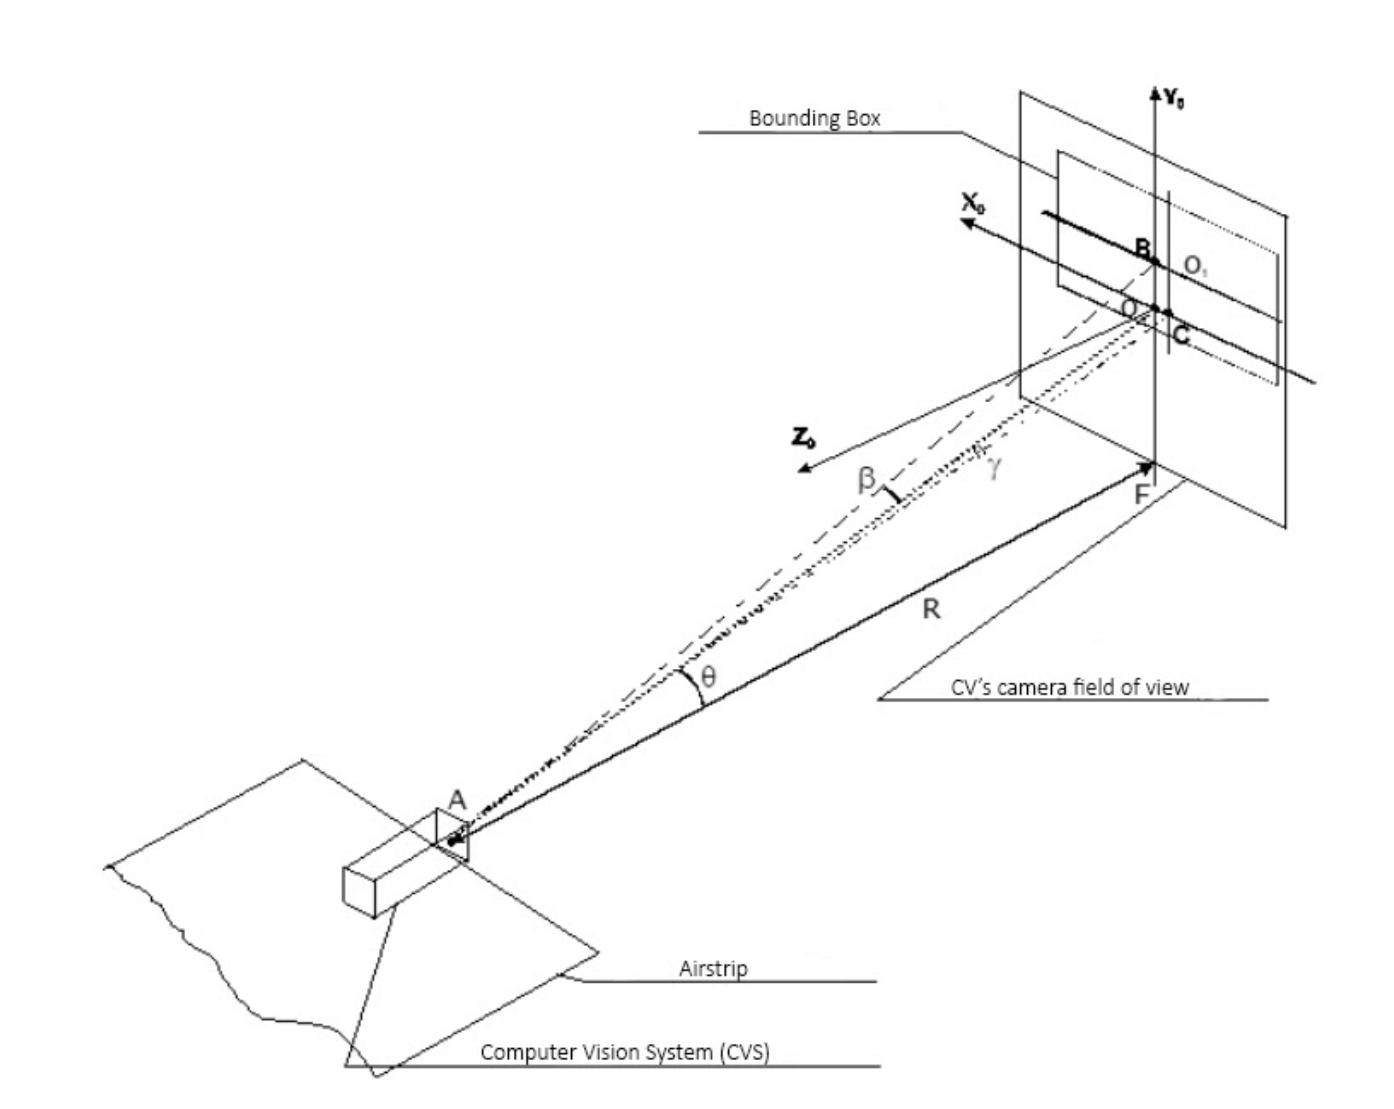 plane automatic landing - Figure 1